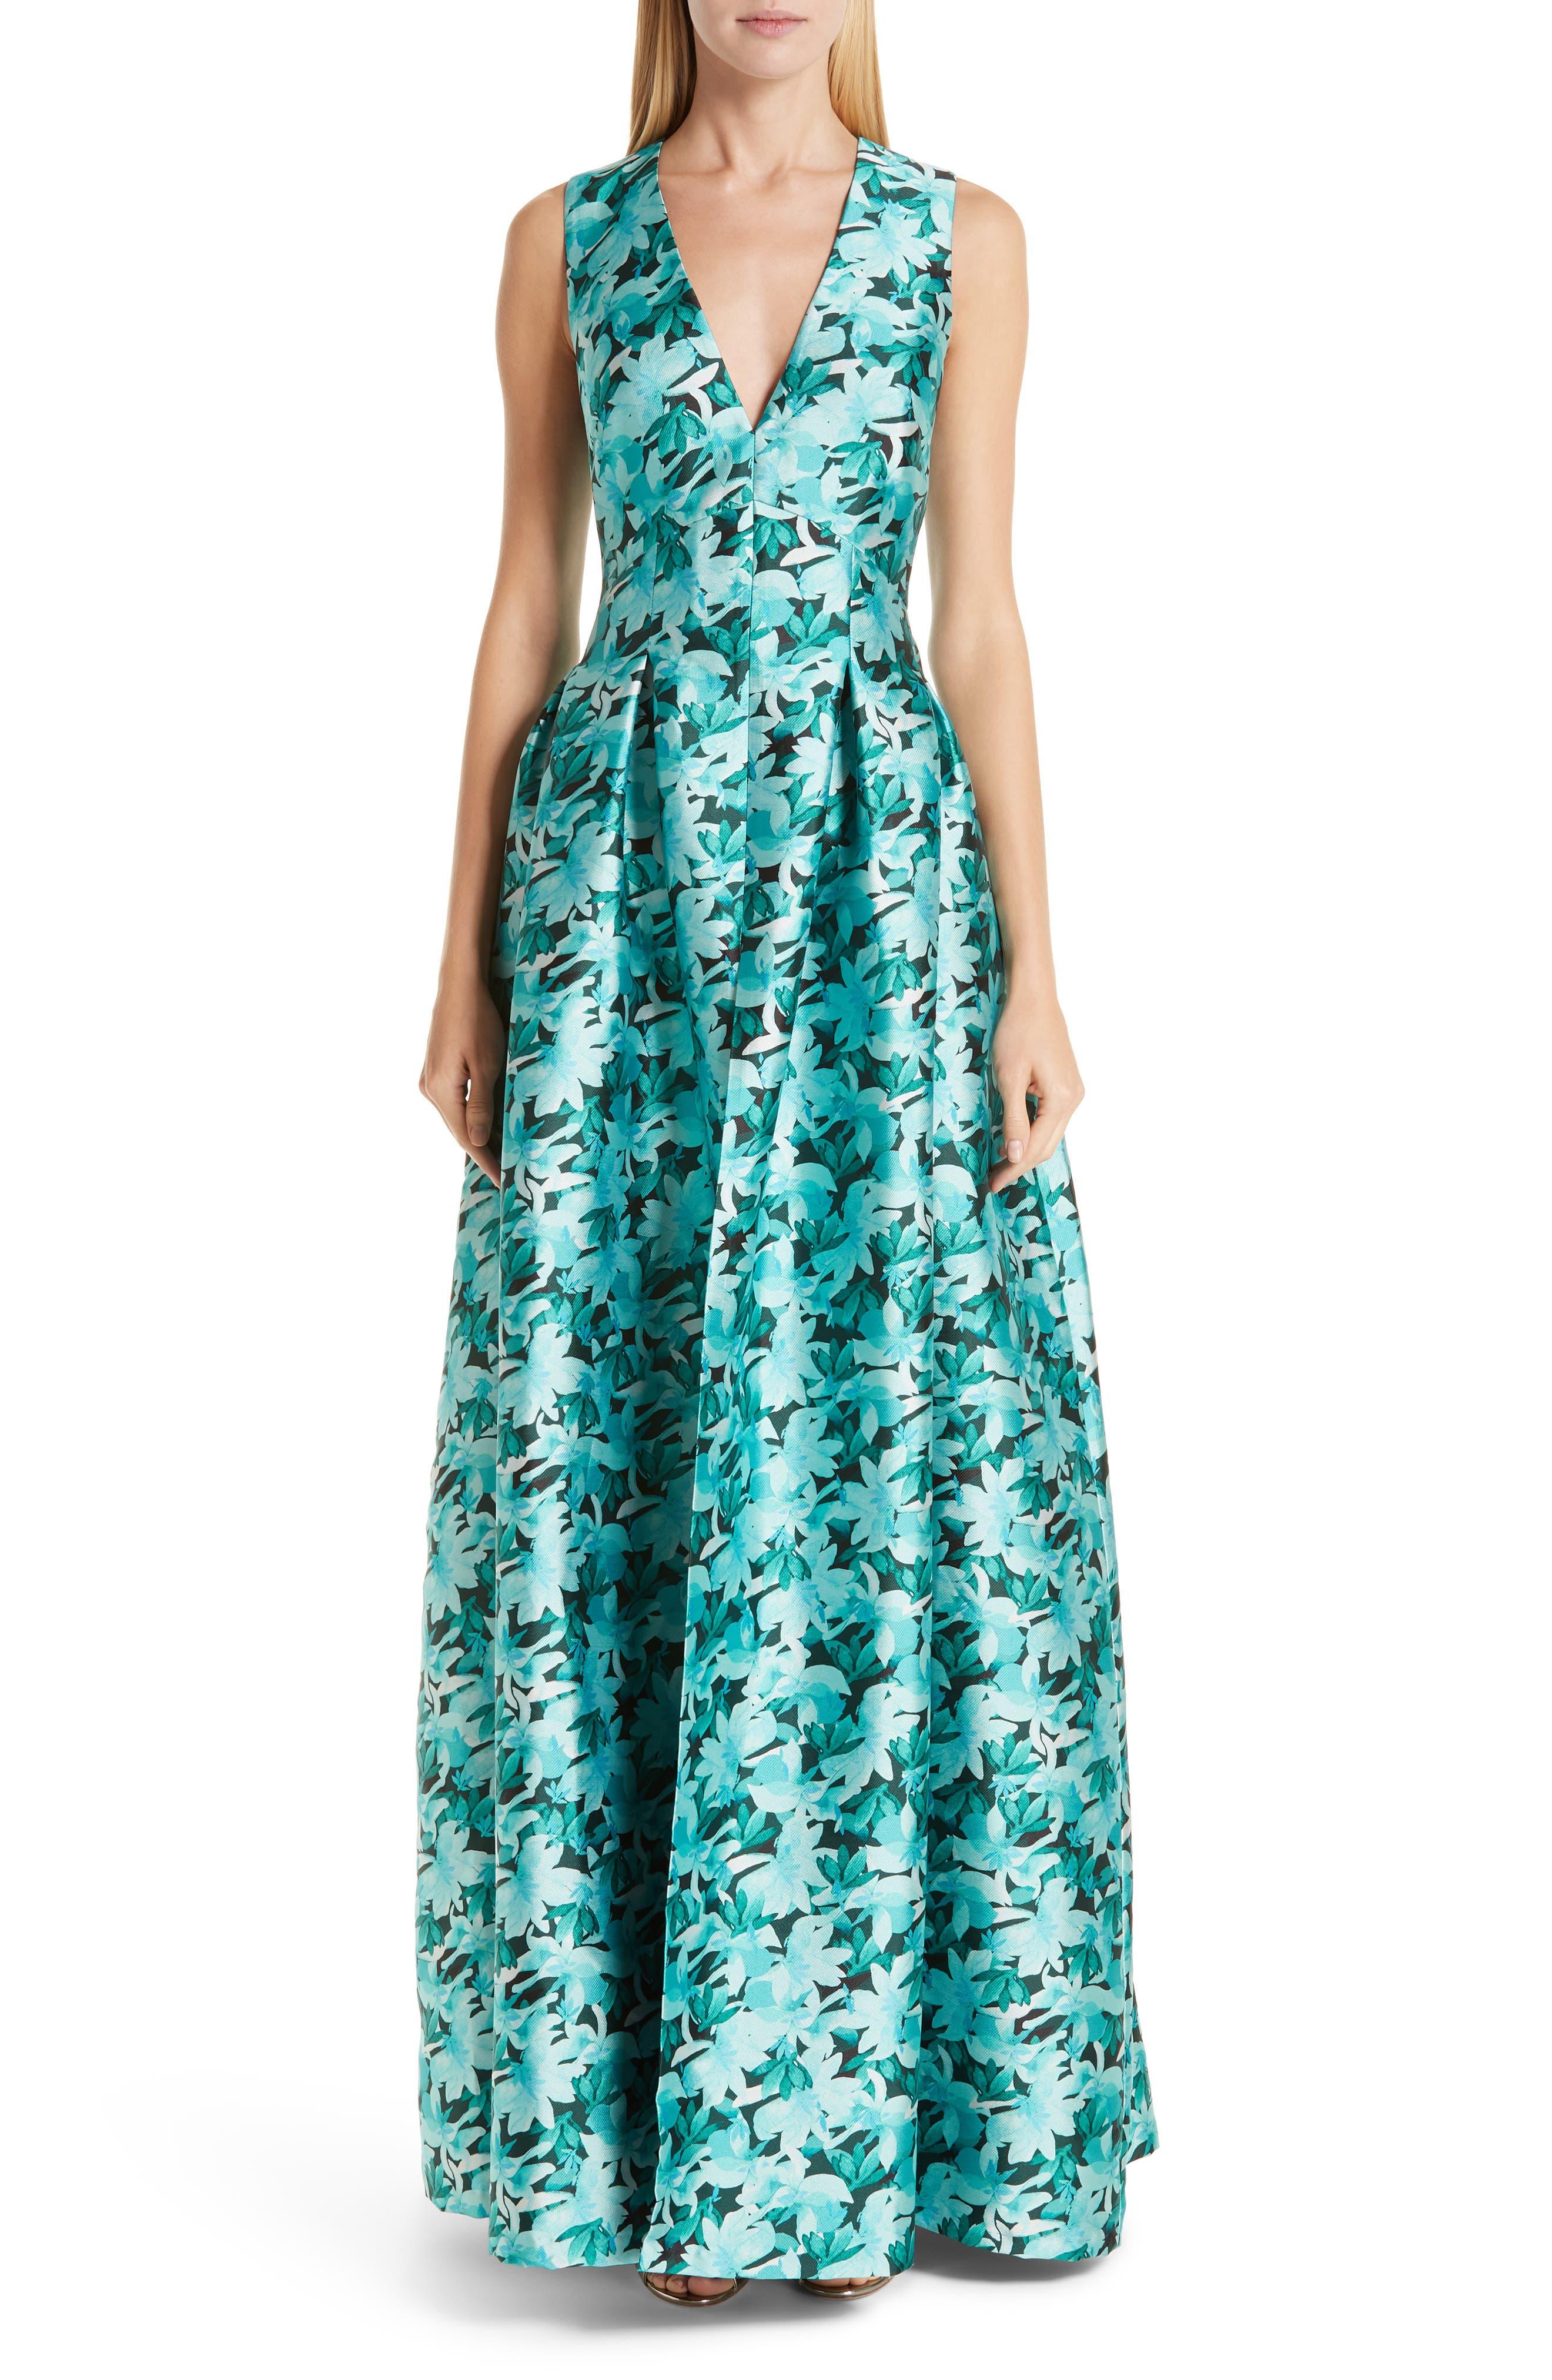 Sachin & Babi Brooke Floral Print Gown